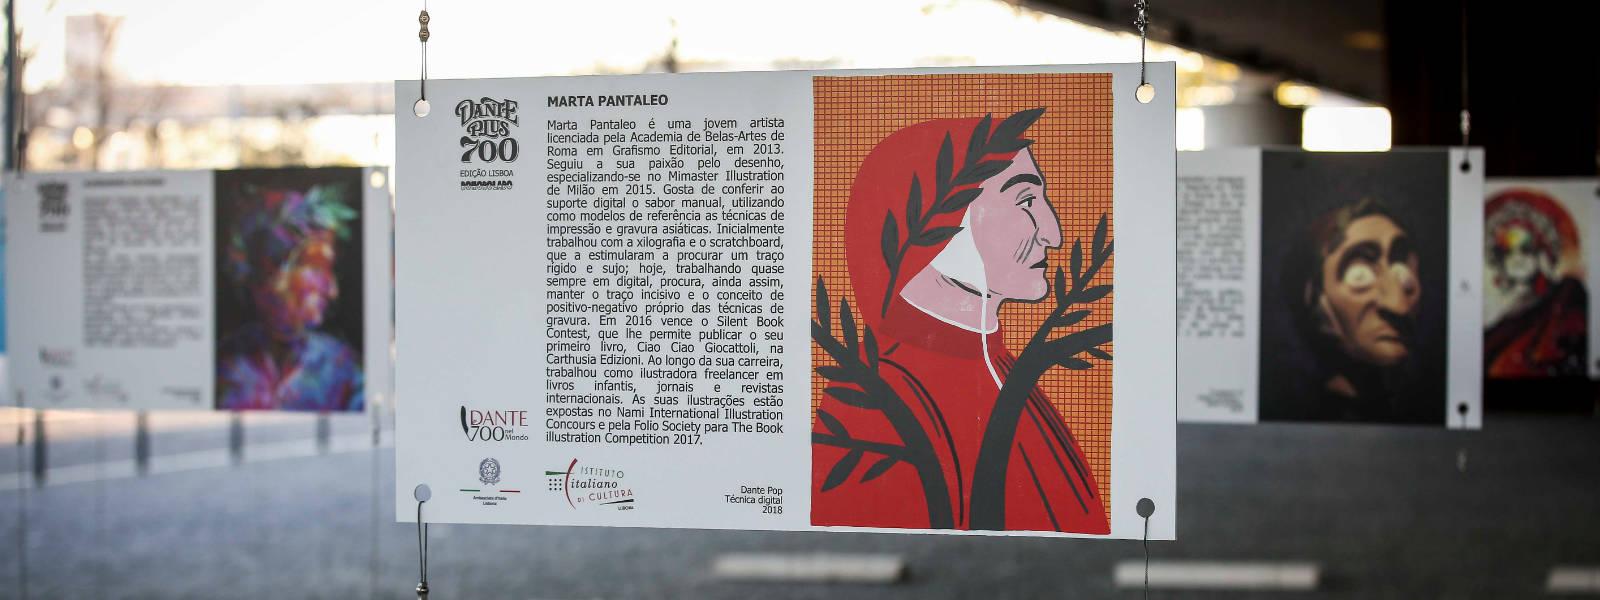 Dante Plus on Tour – Lisbona